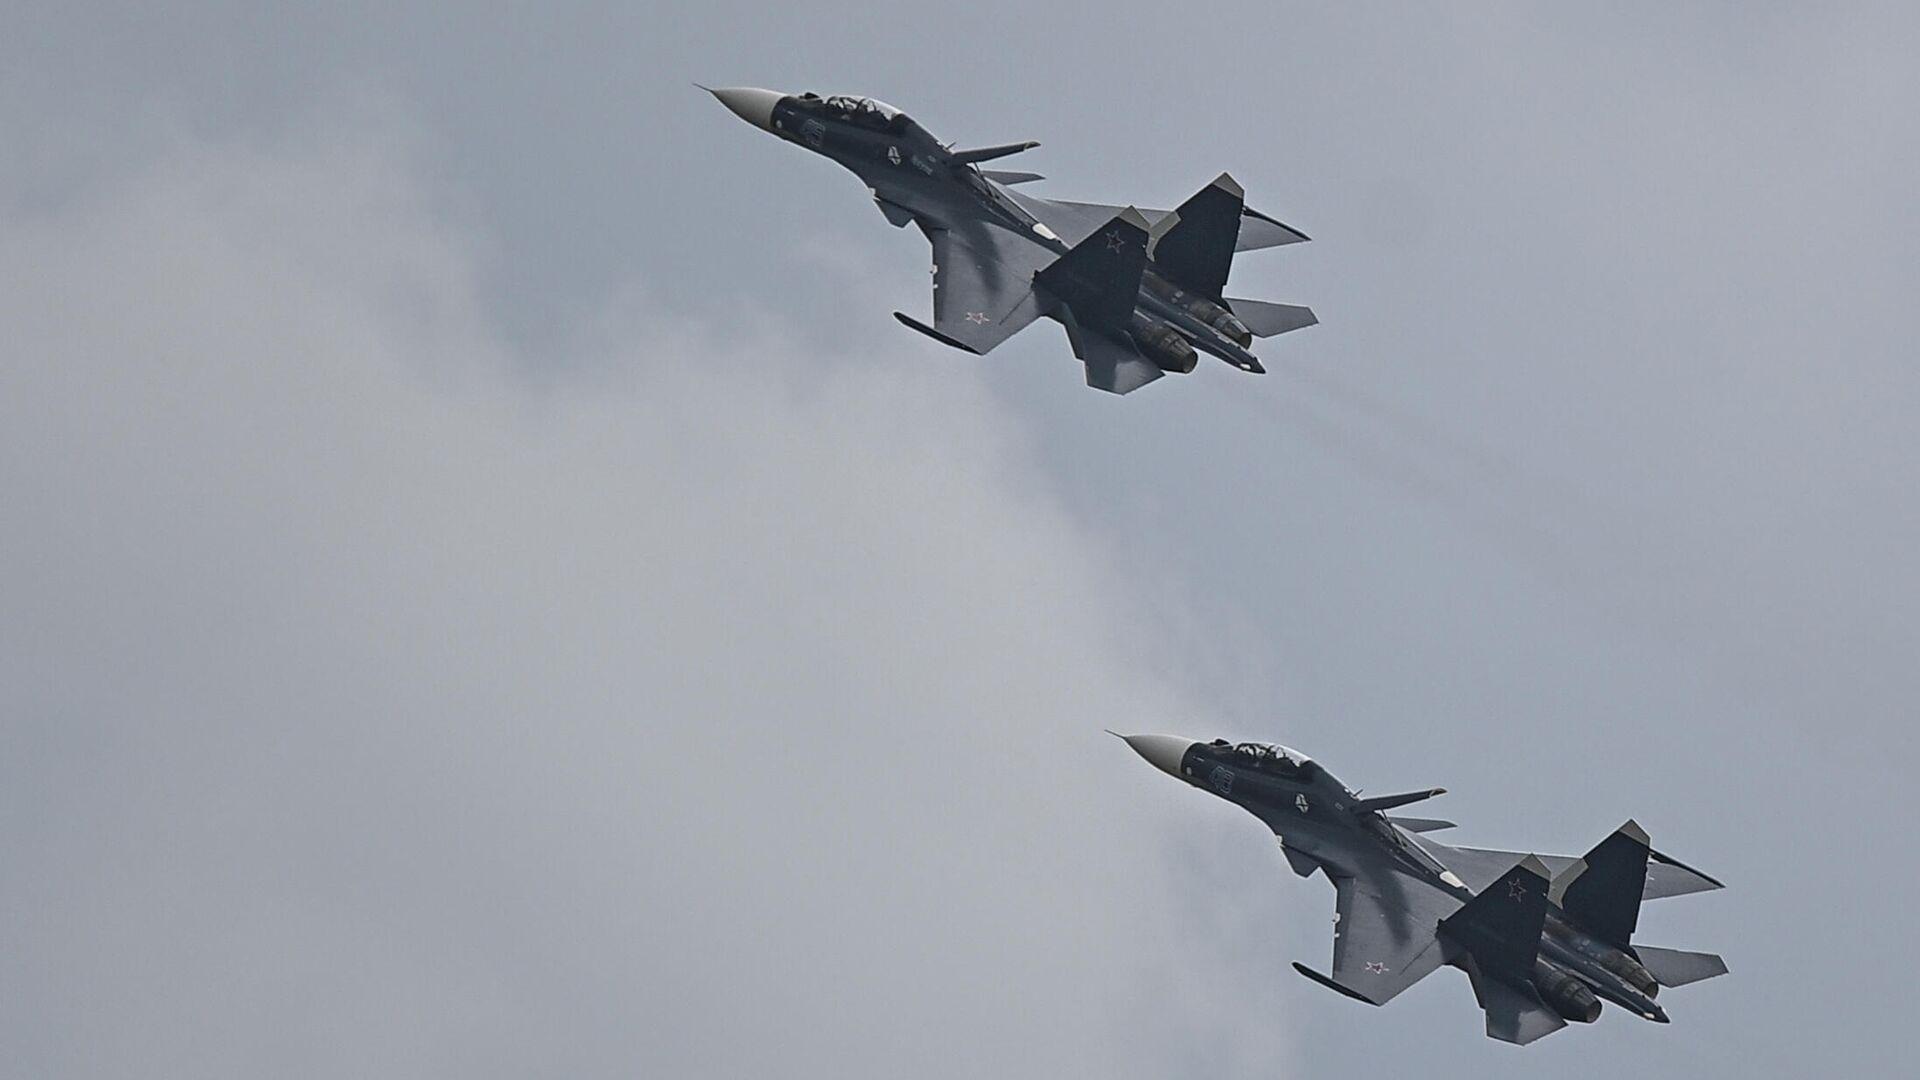 Истребители Су-30СМ  - РИА Новости, 1920, 29.09.2021